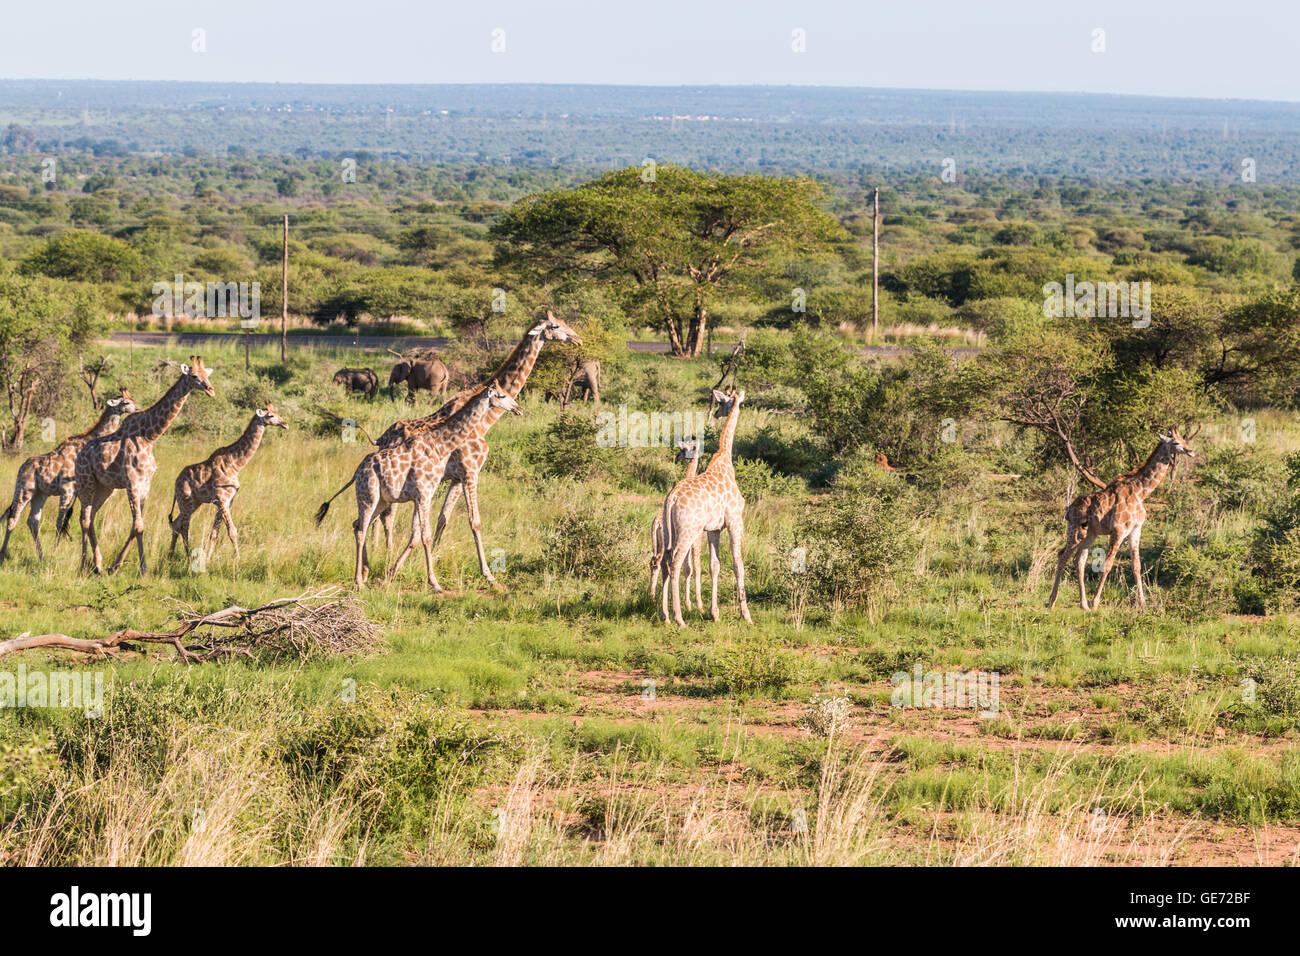 Giraffes in African Safari - Stock Image